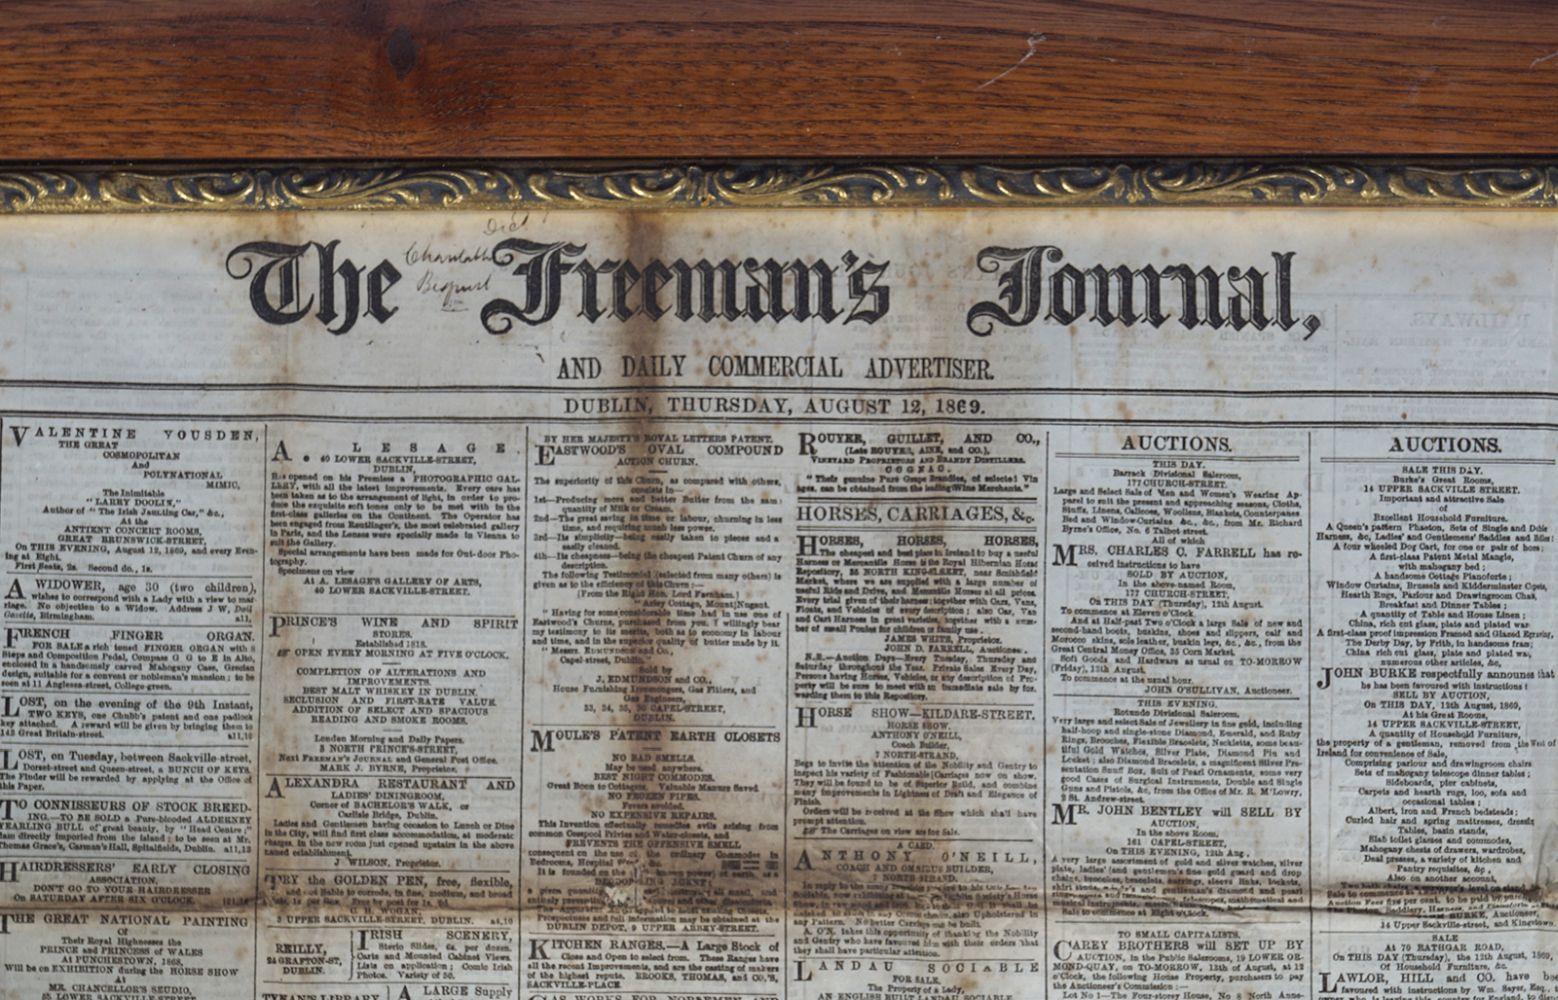 THE FREEMAN'S JOURNAL FRAMED NEWSPAPER - Image 2 of 8